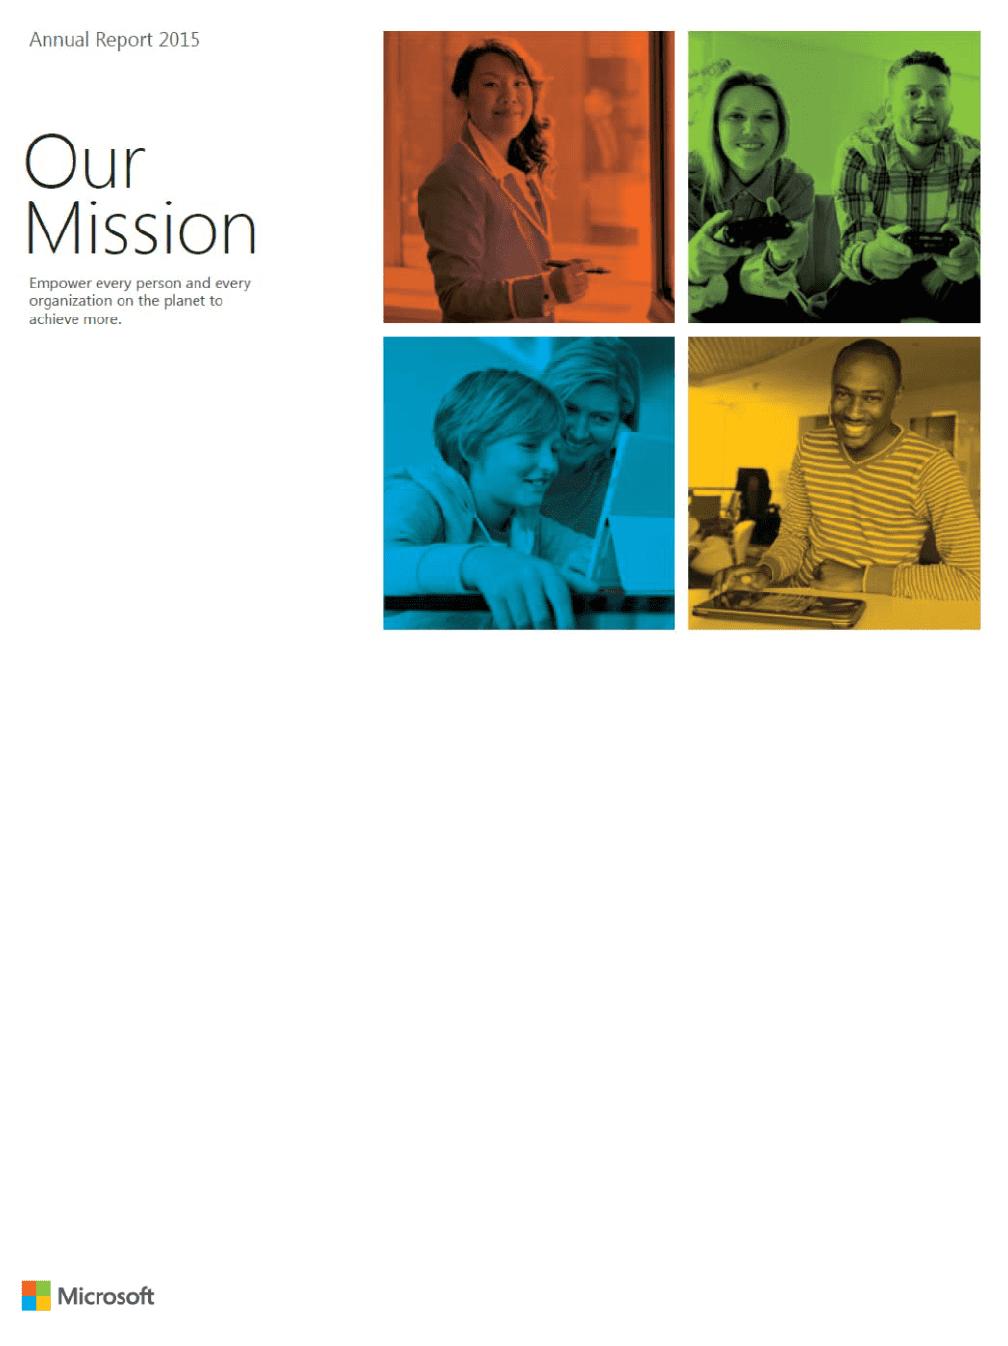 microsoft 2015 annual report download